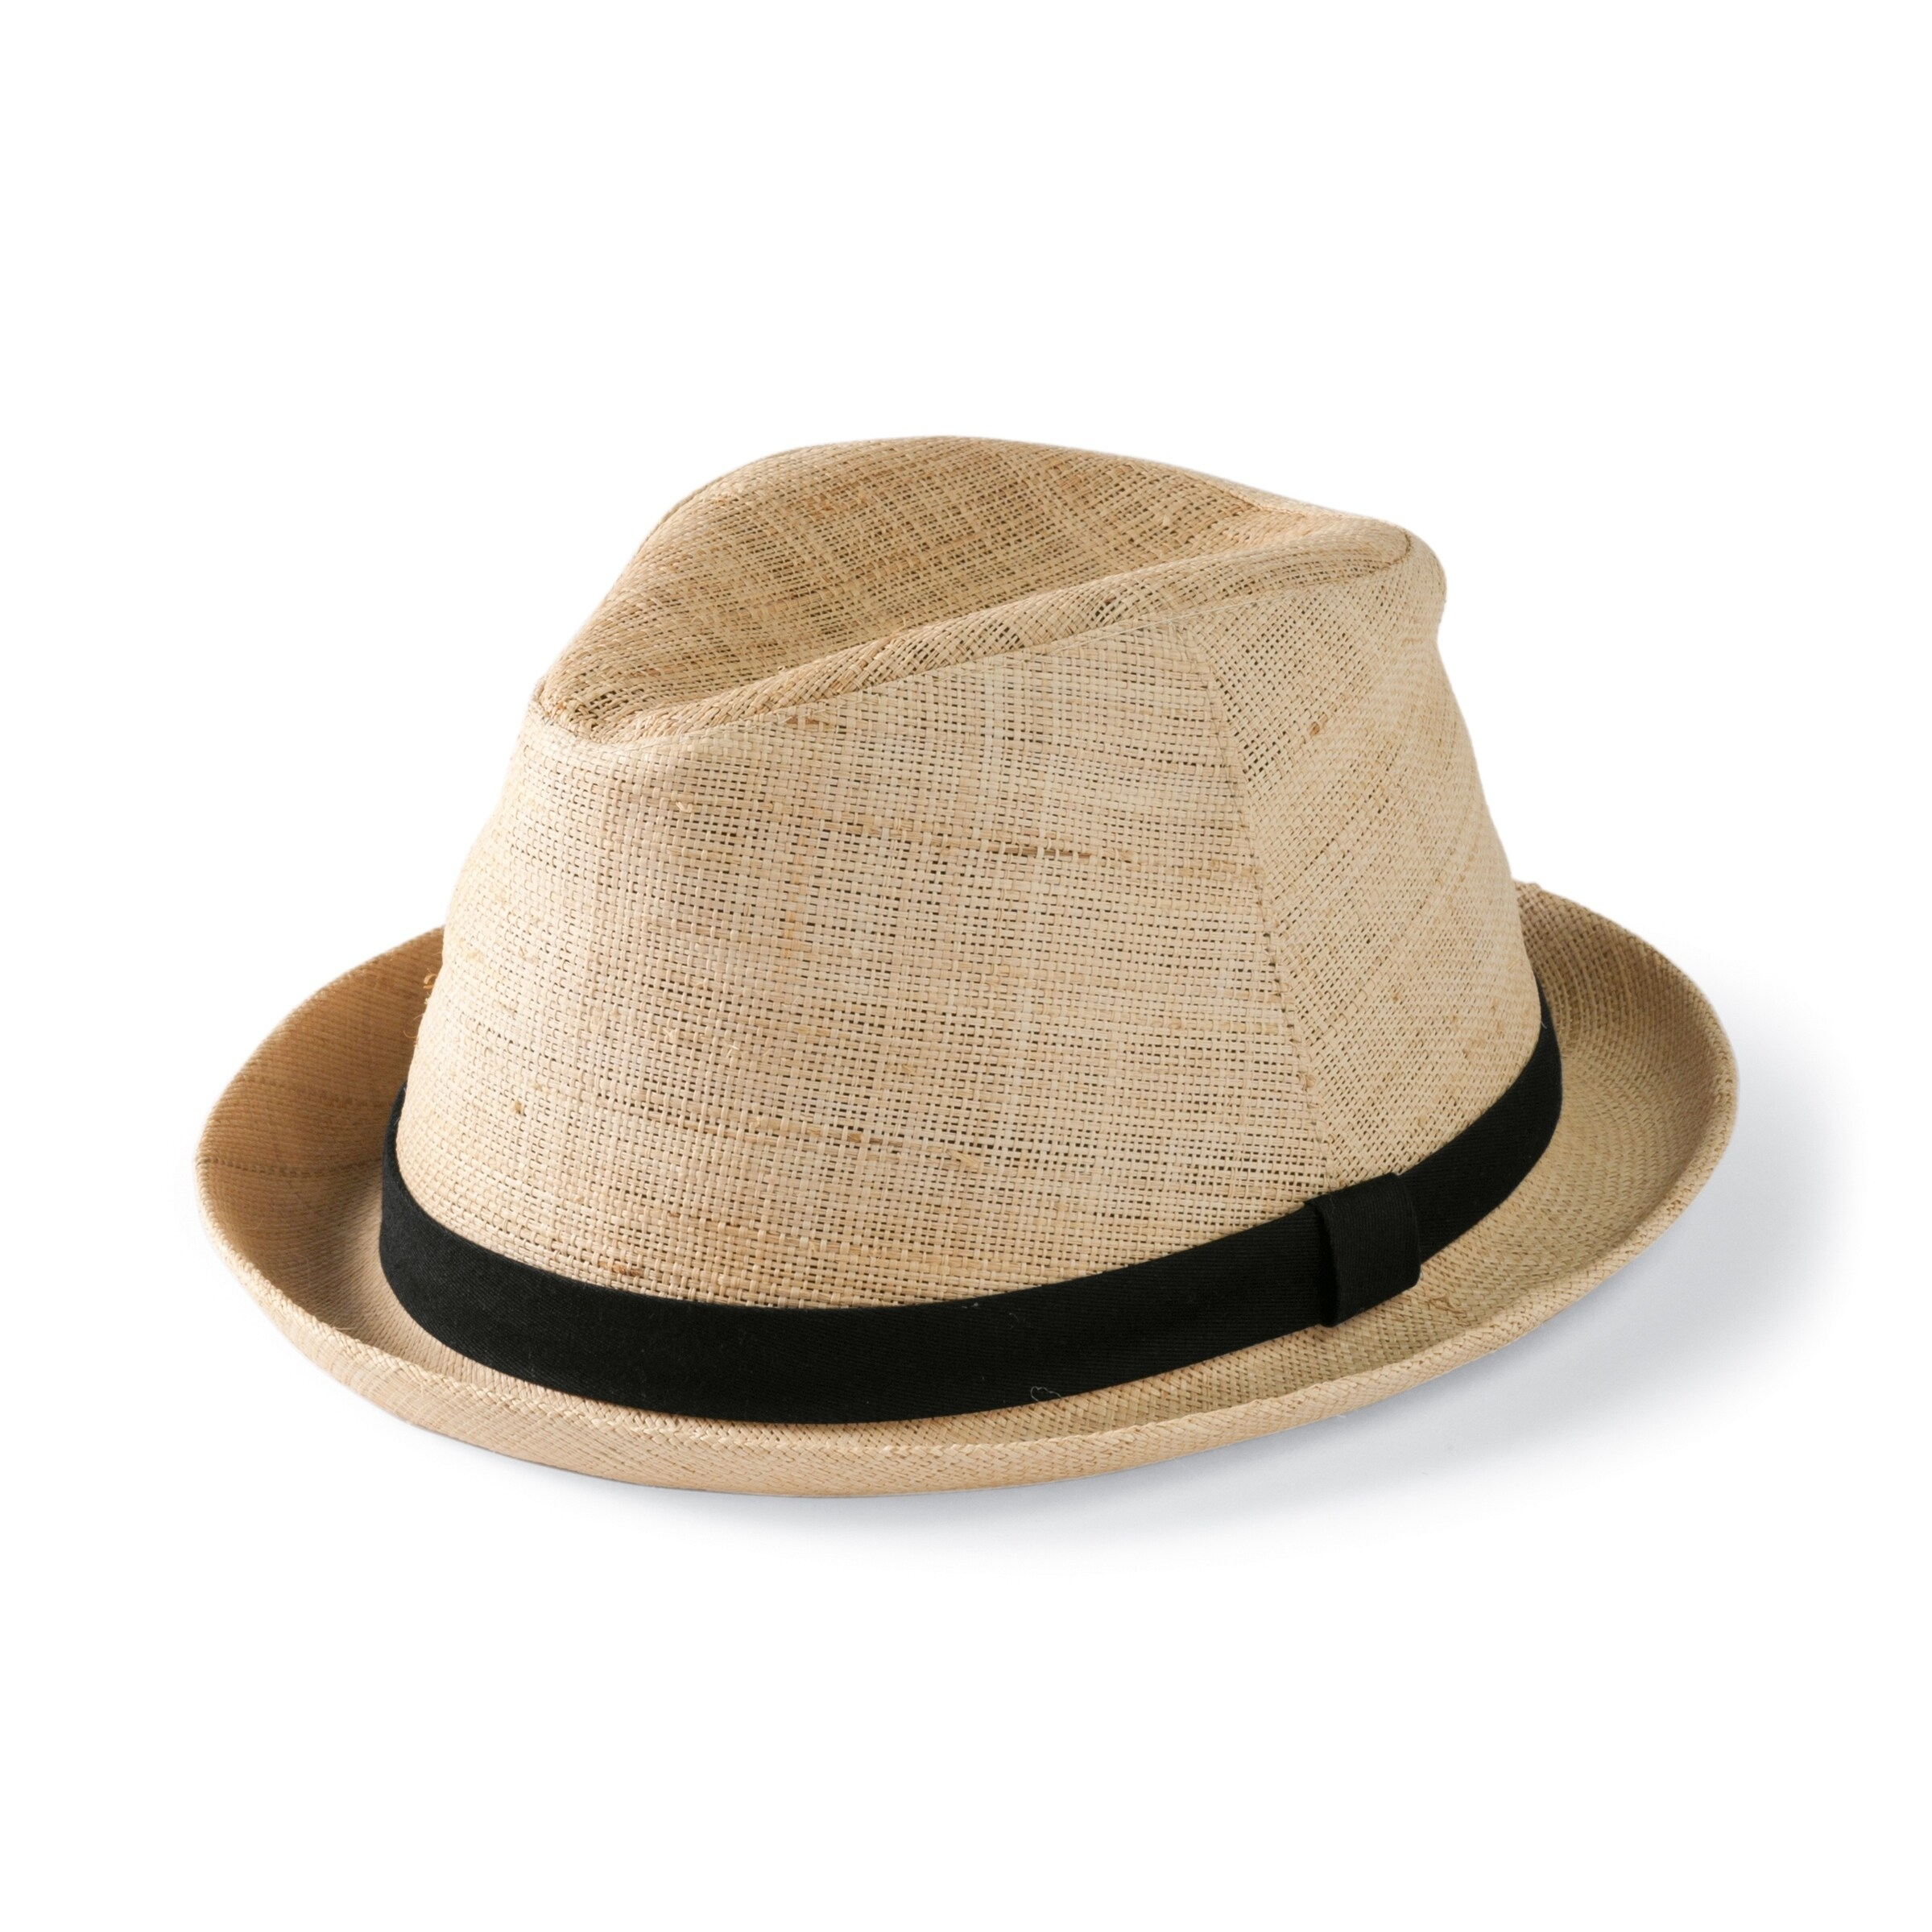 447eda208 San Diego Hat Company/Womens Core/Fedora, large unisex - natural